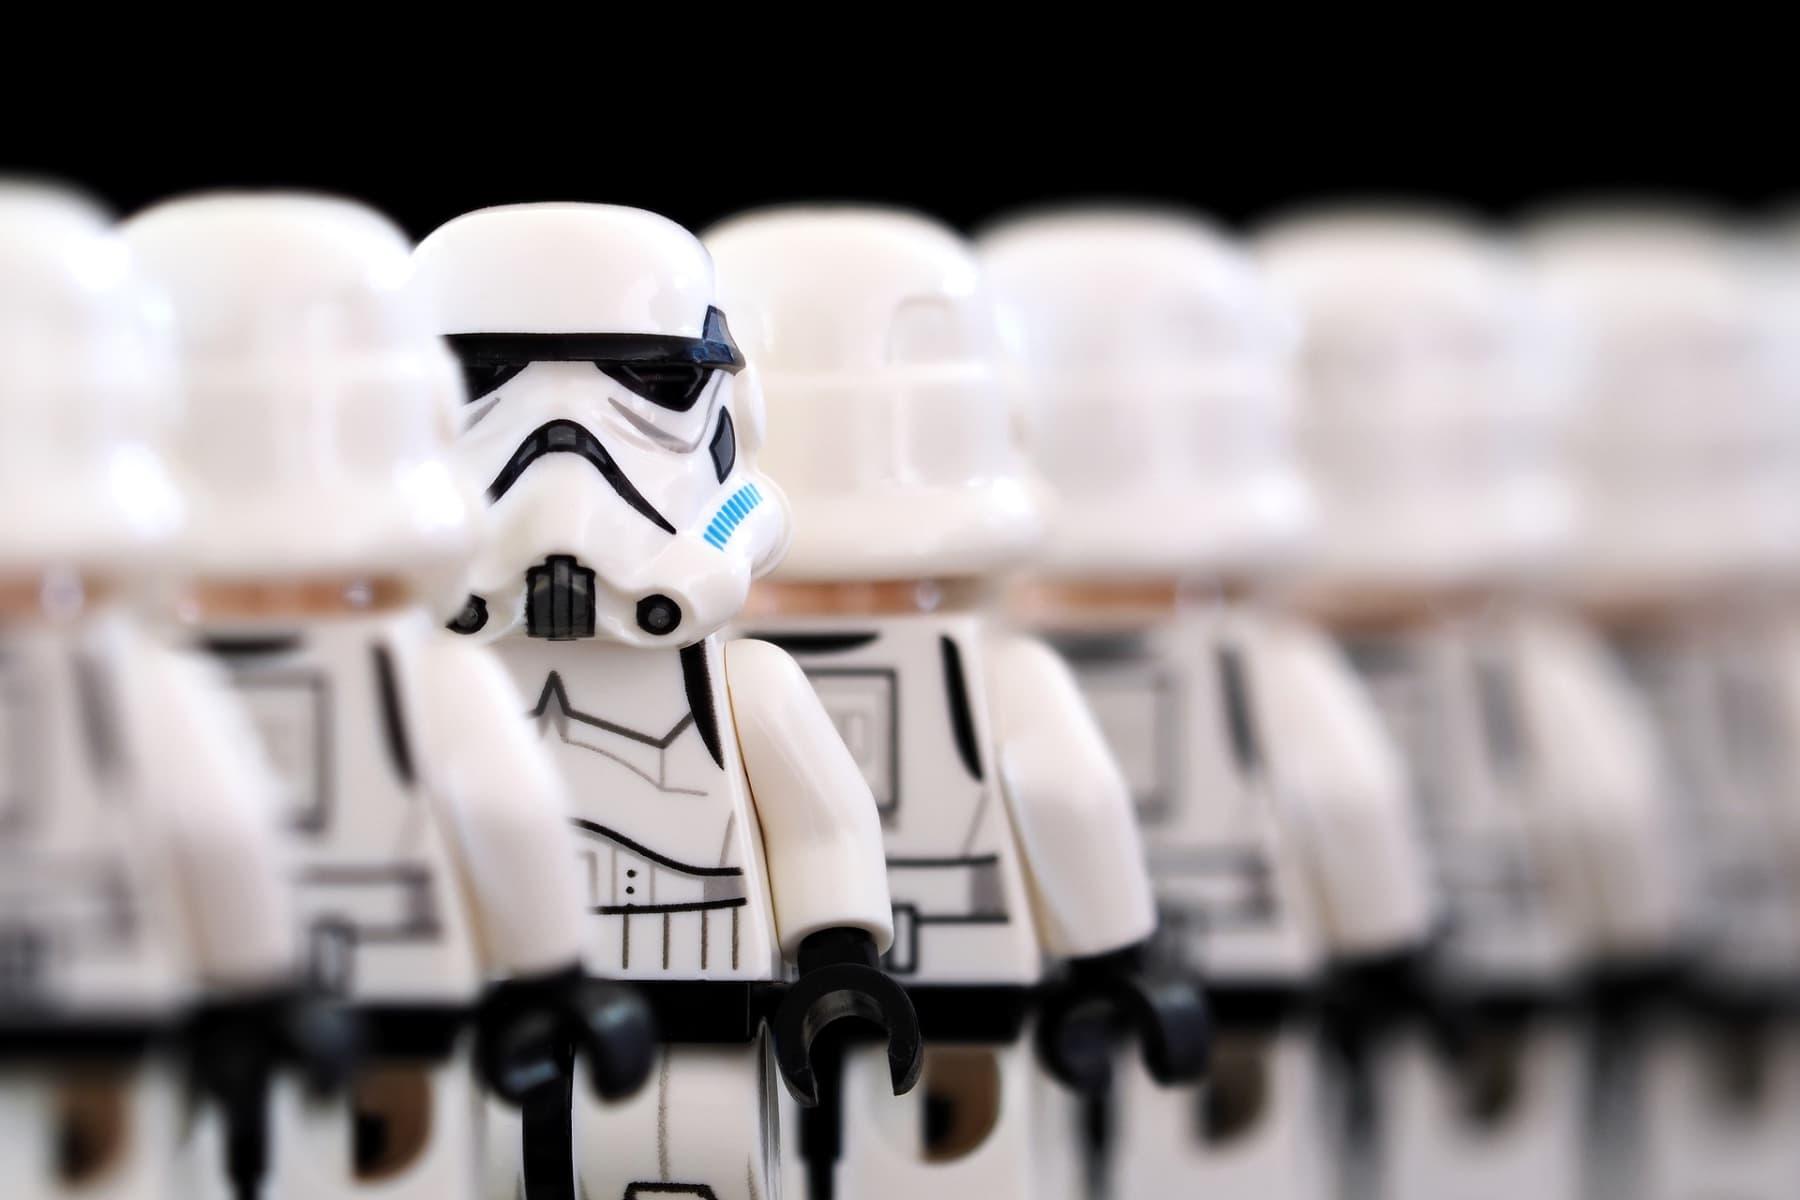 Studie zu Star Wars-Tag